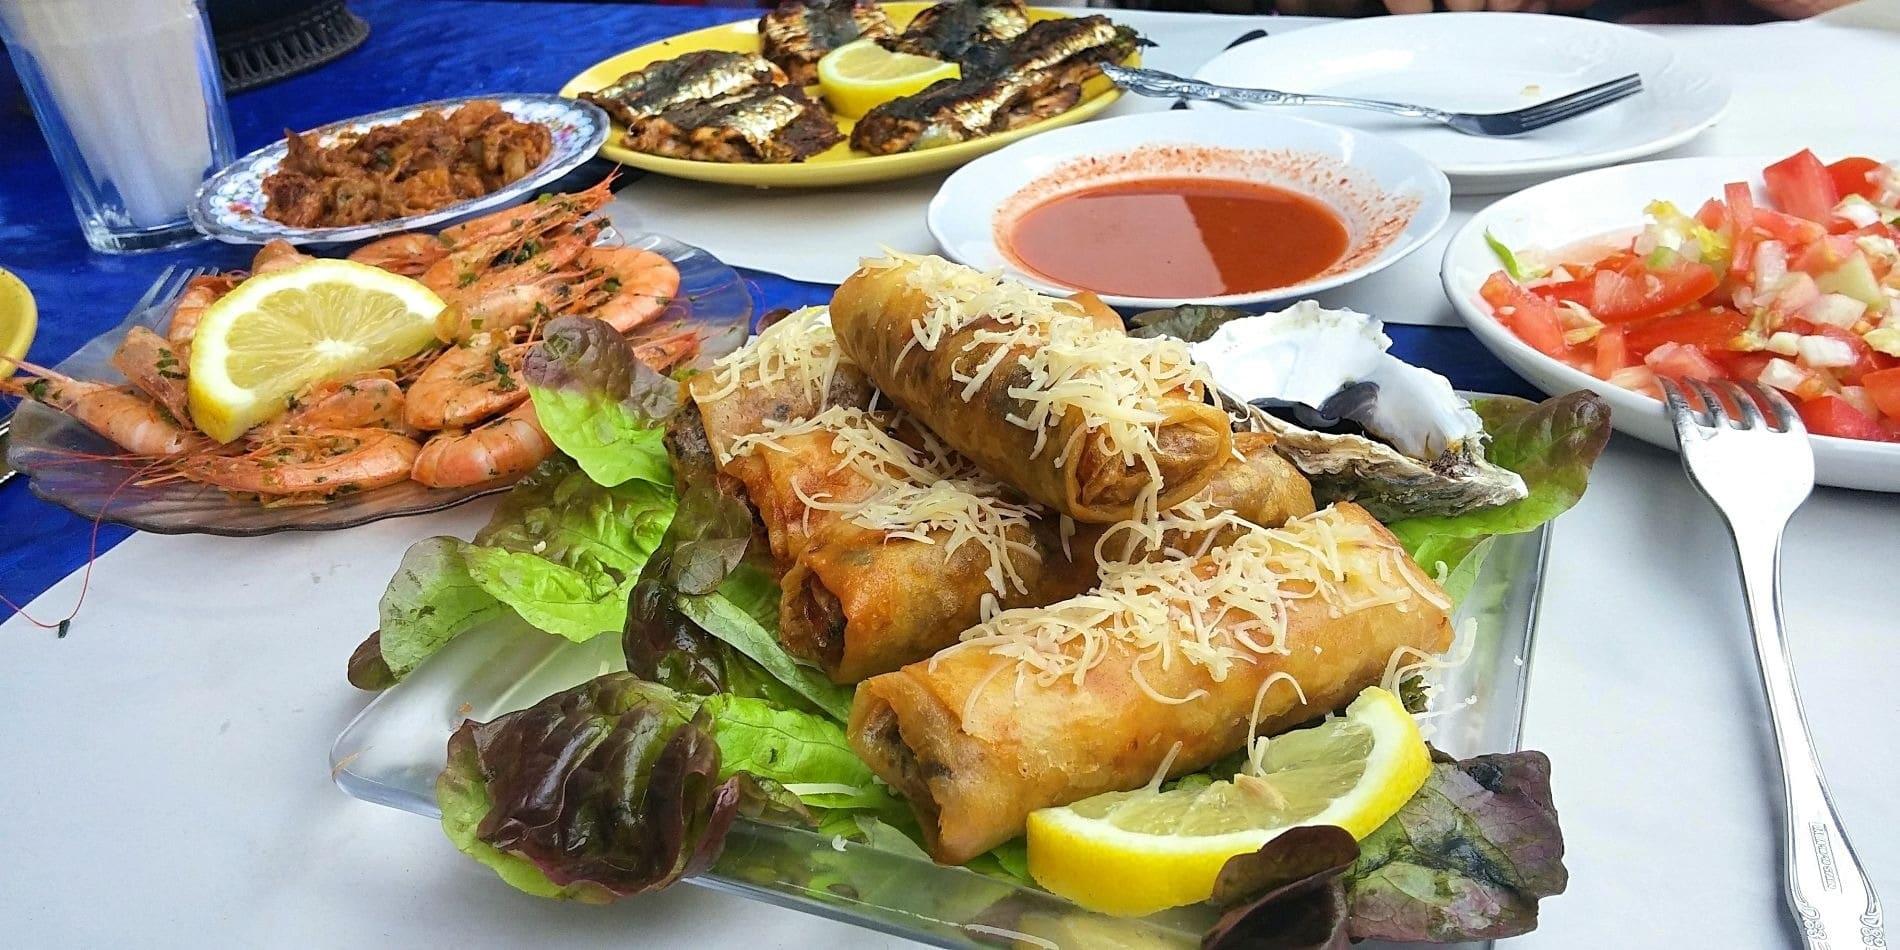 Close up photo of fried nem-like appetizers.